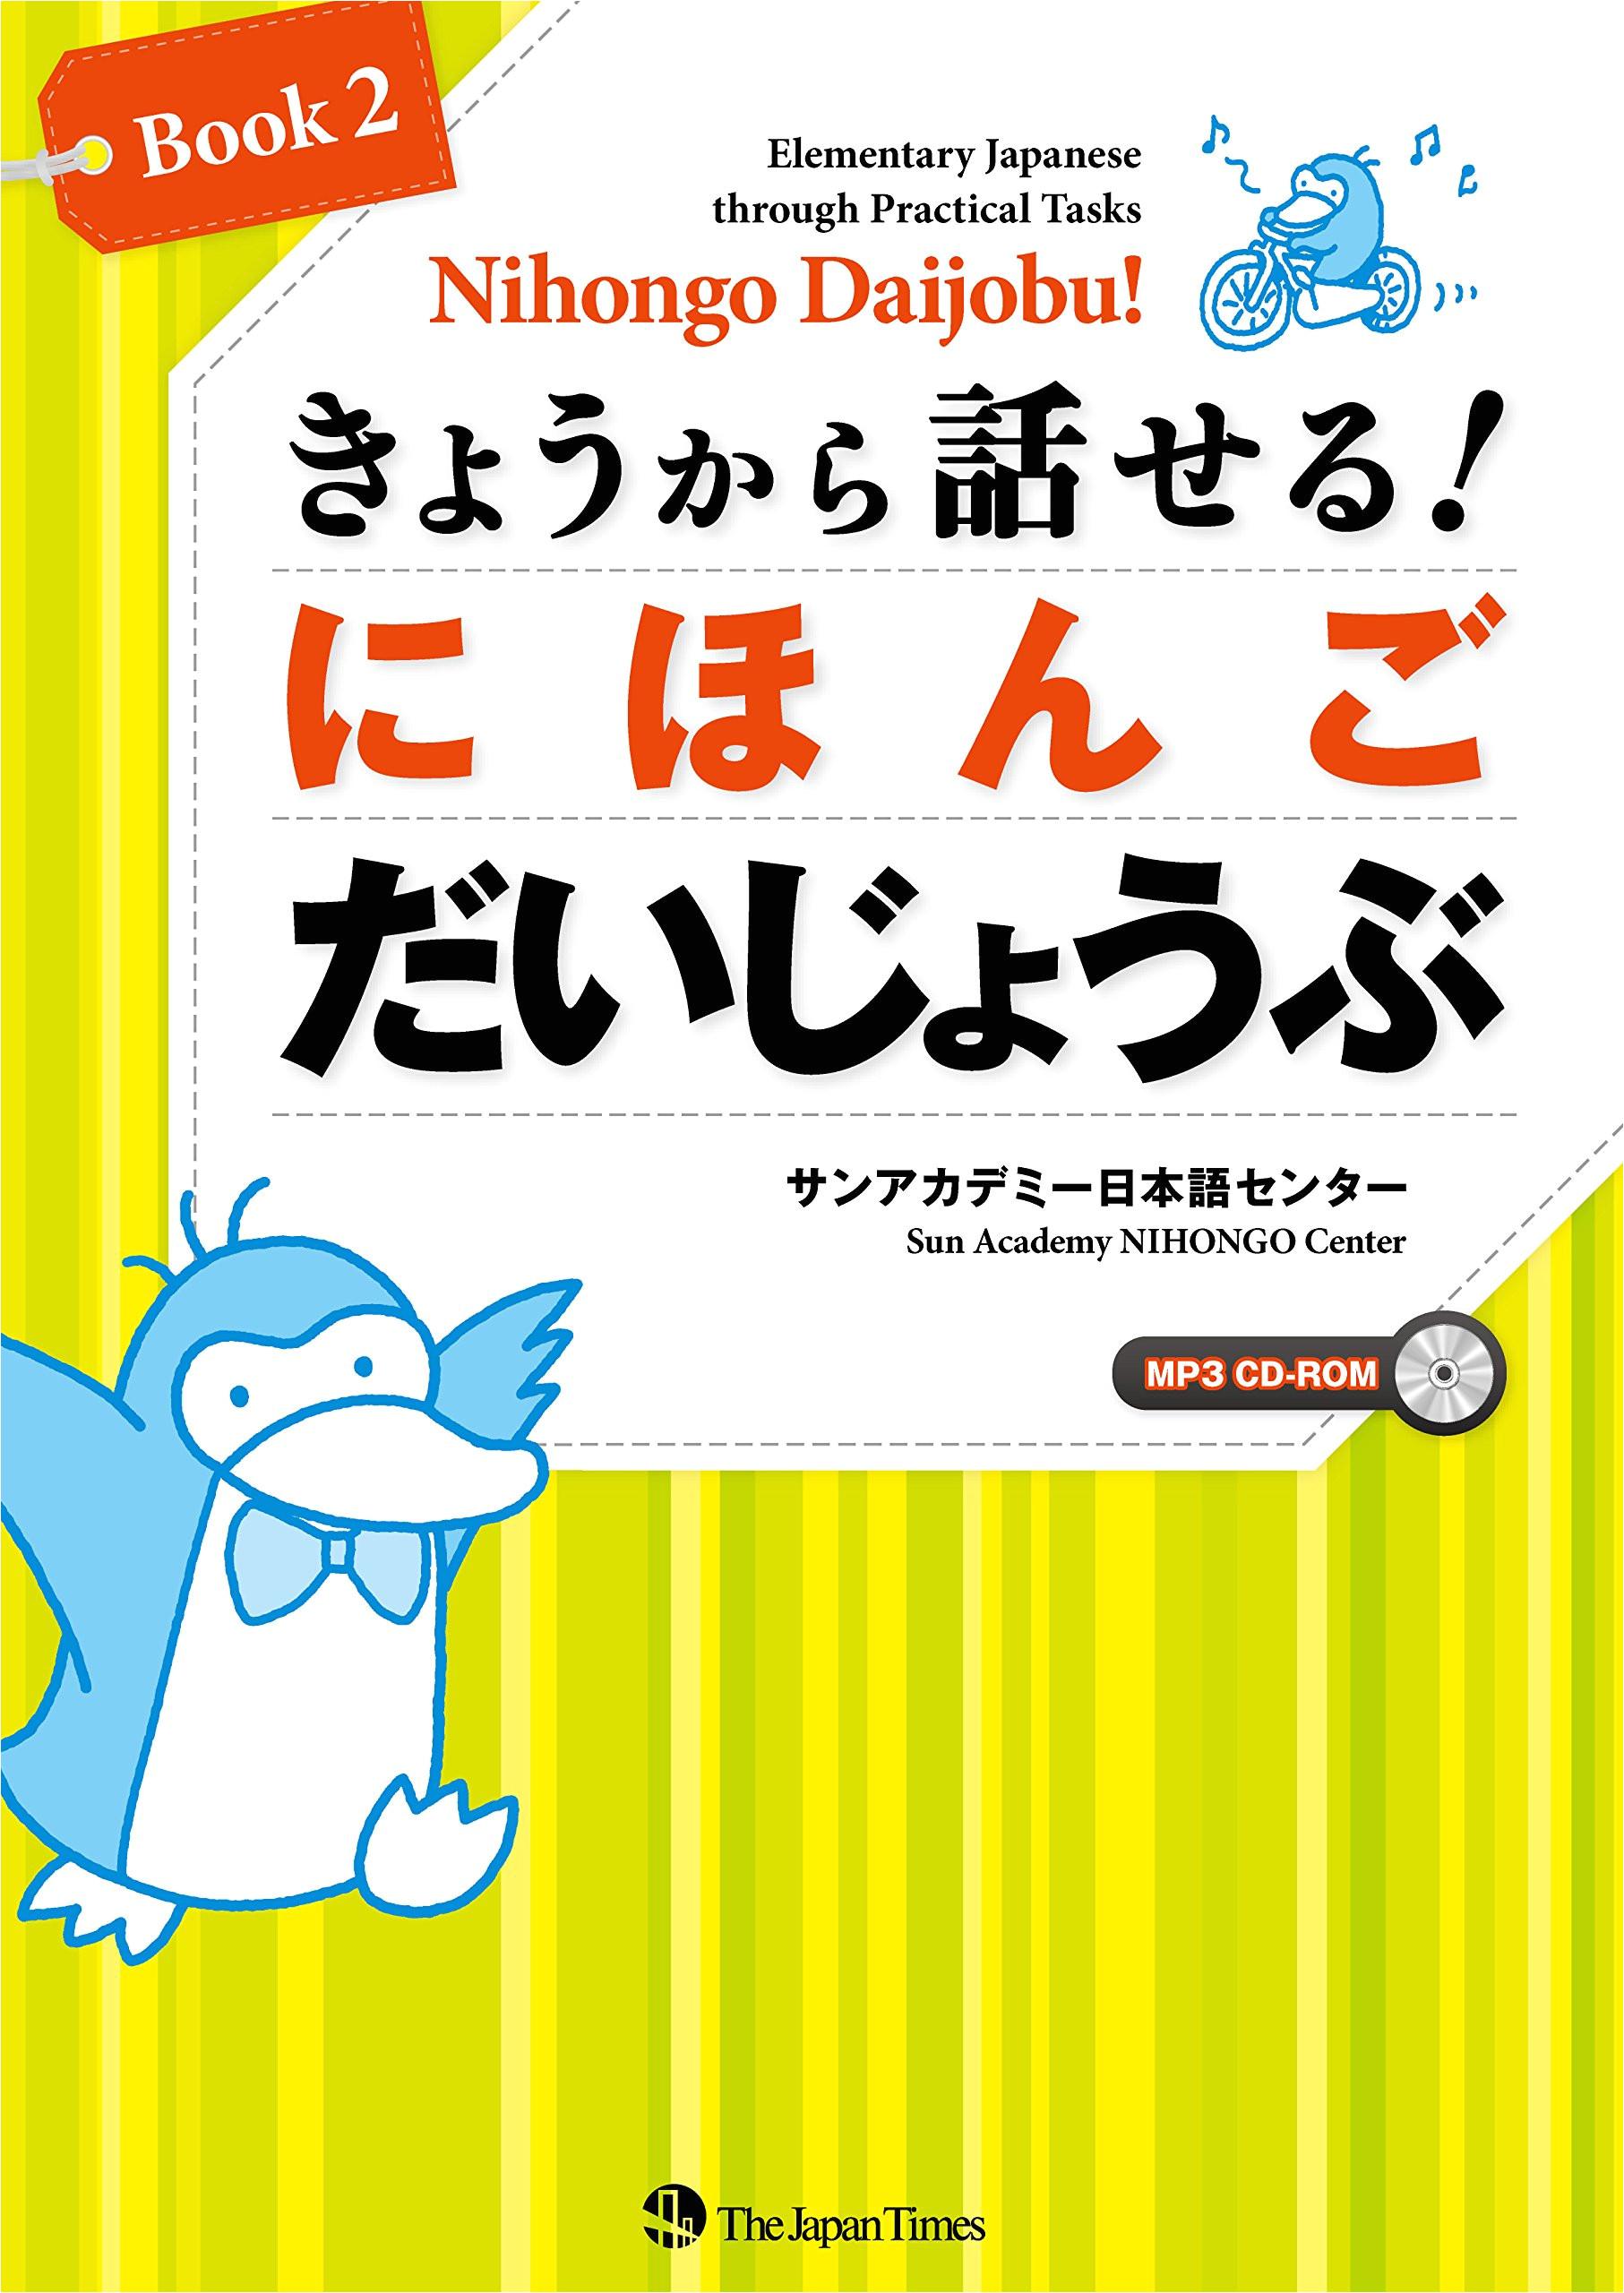 book 2 elementary japanese through practical tasks a a a a a e c a a a a a a a a a a a a book2 cd rom mp3a a 9784789016186 amazon com books